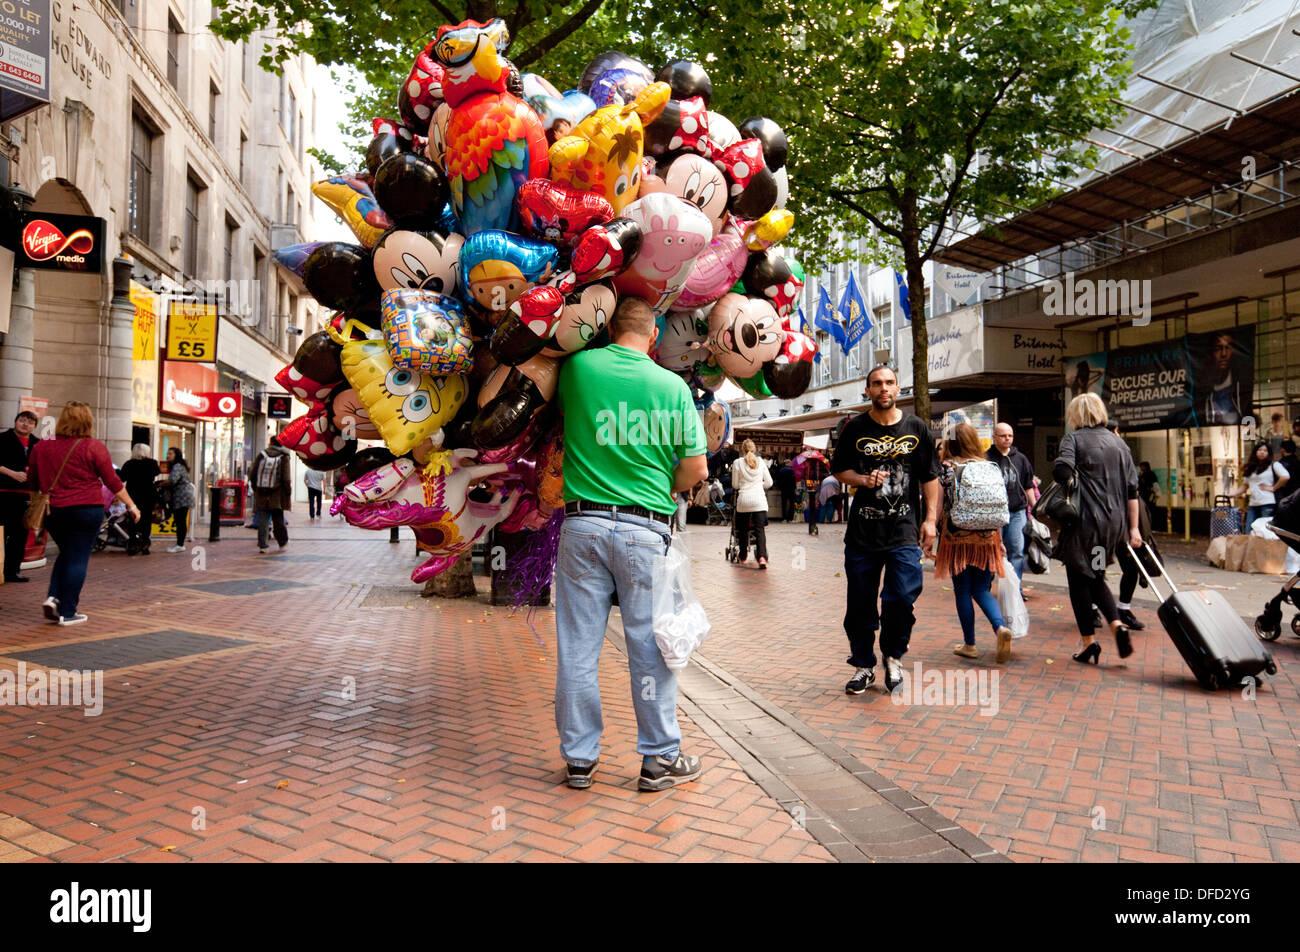 Ballon-Verkäufer, New Street Fußgängerzone High Street, Birmingham, England UK Stockbild